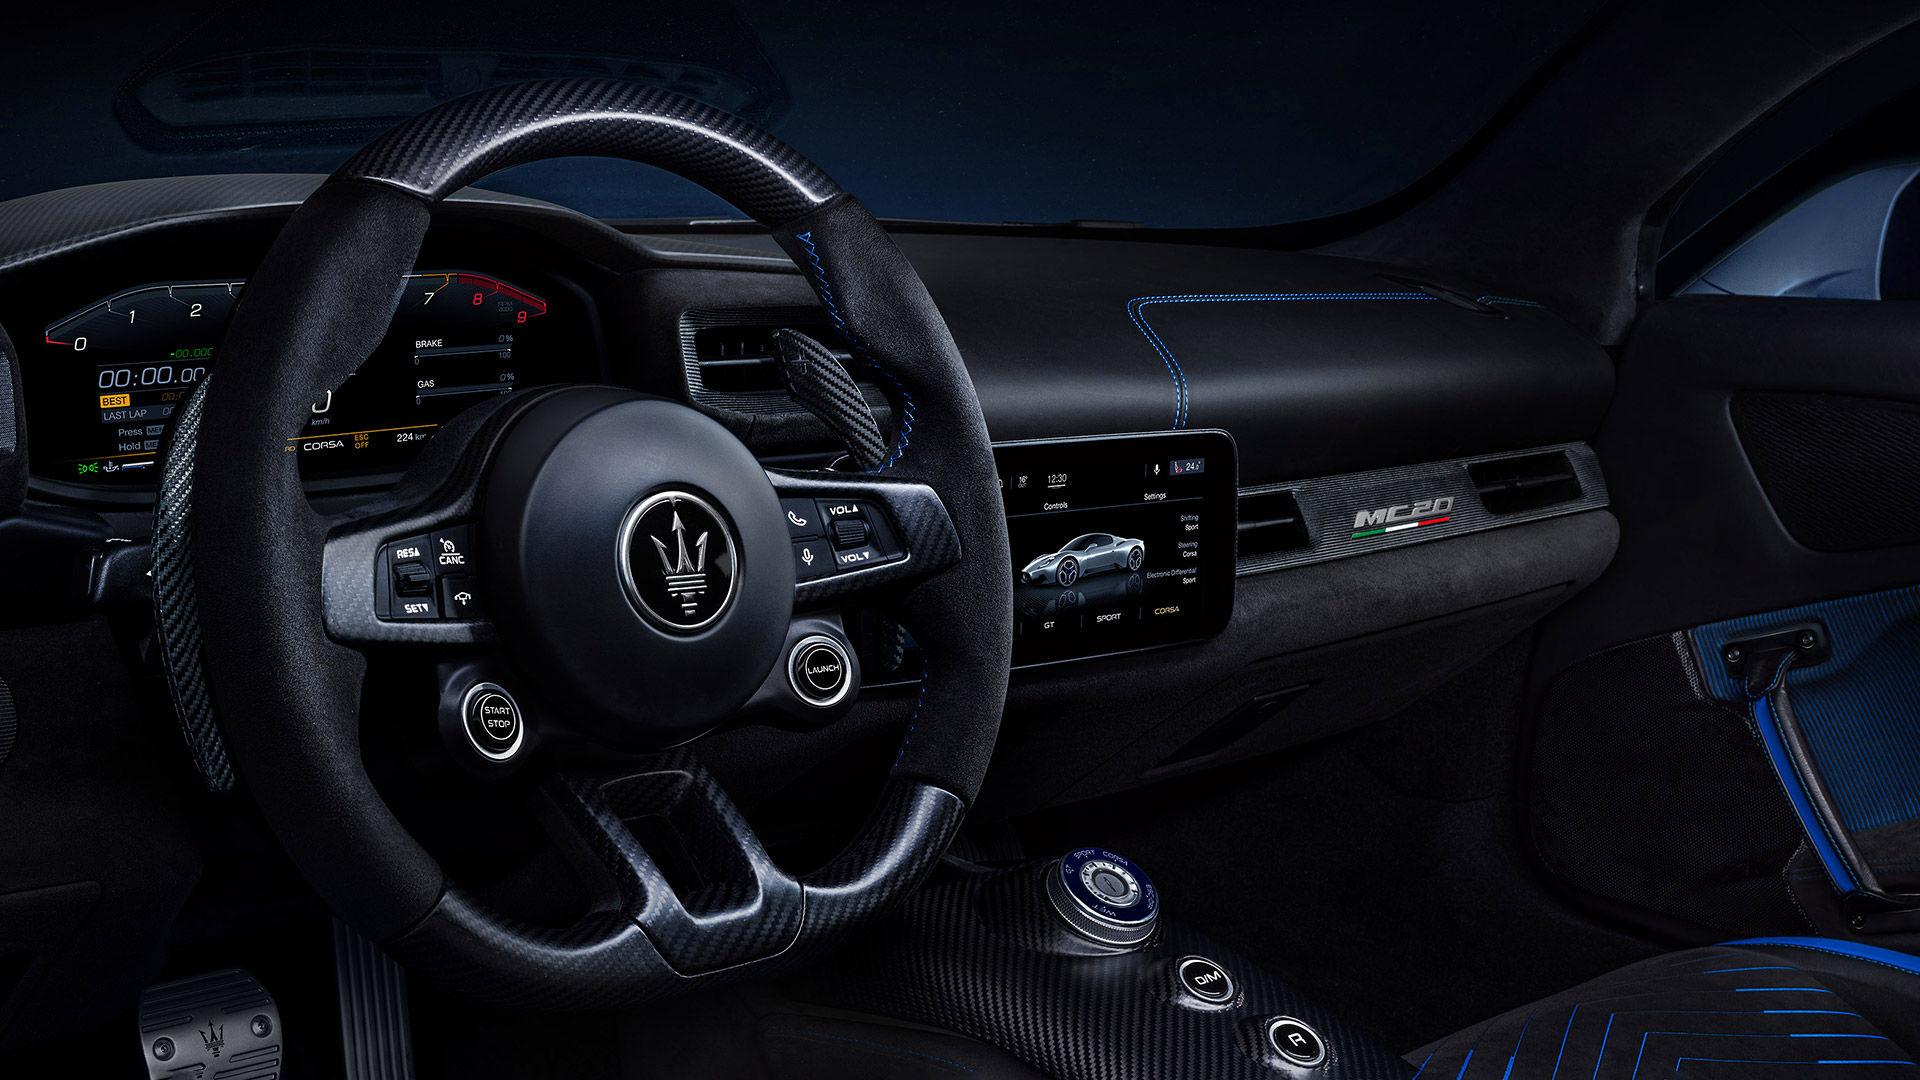 Maserati MC20 Armaturenbrett mit der Unterhaltungsplattform TIDAL